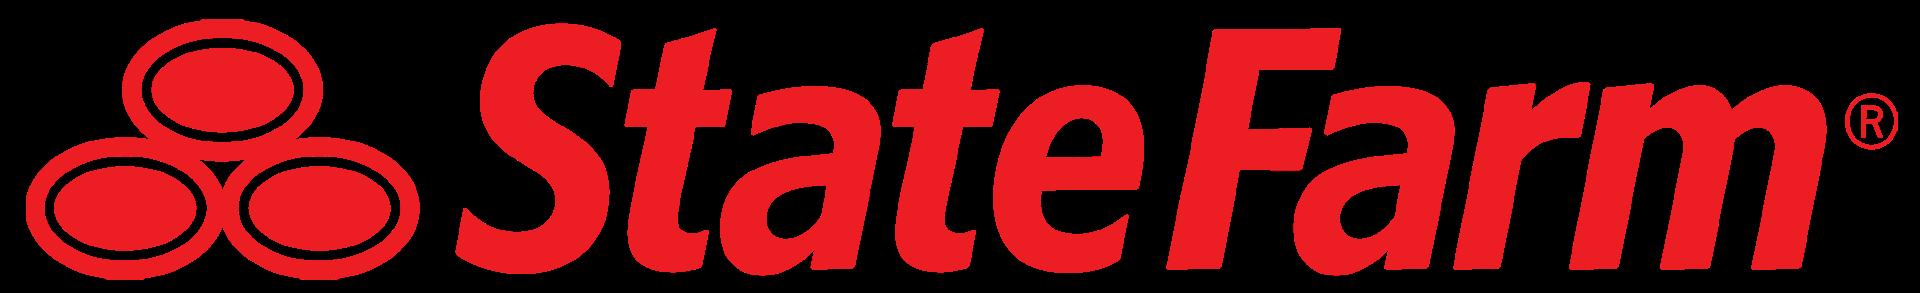 State-Farm-Logo-1